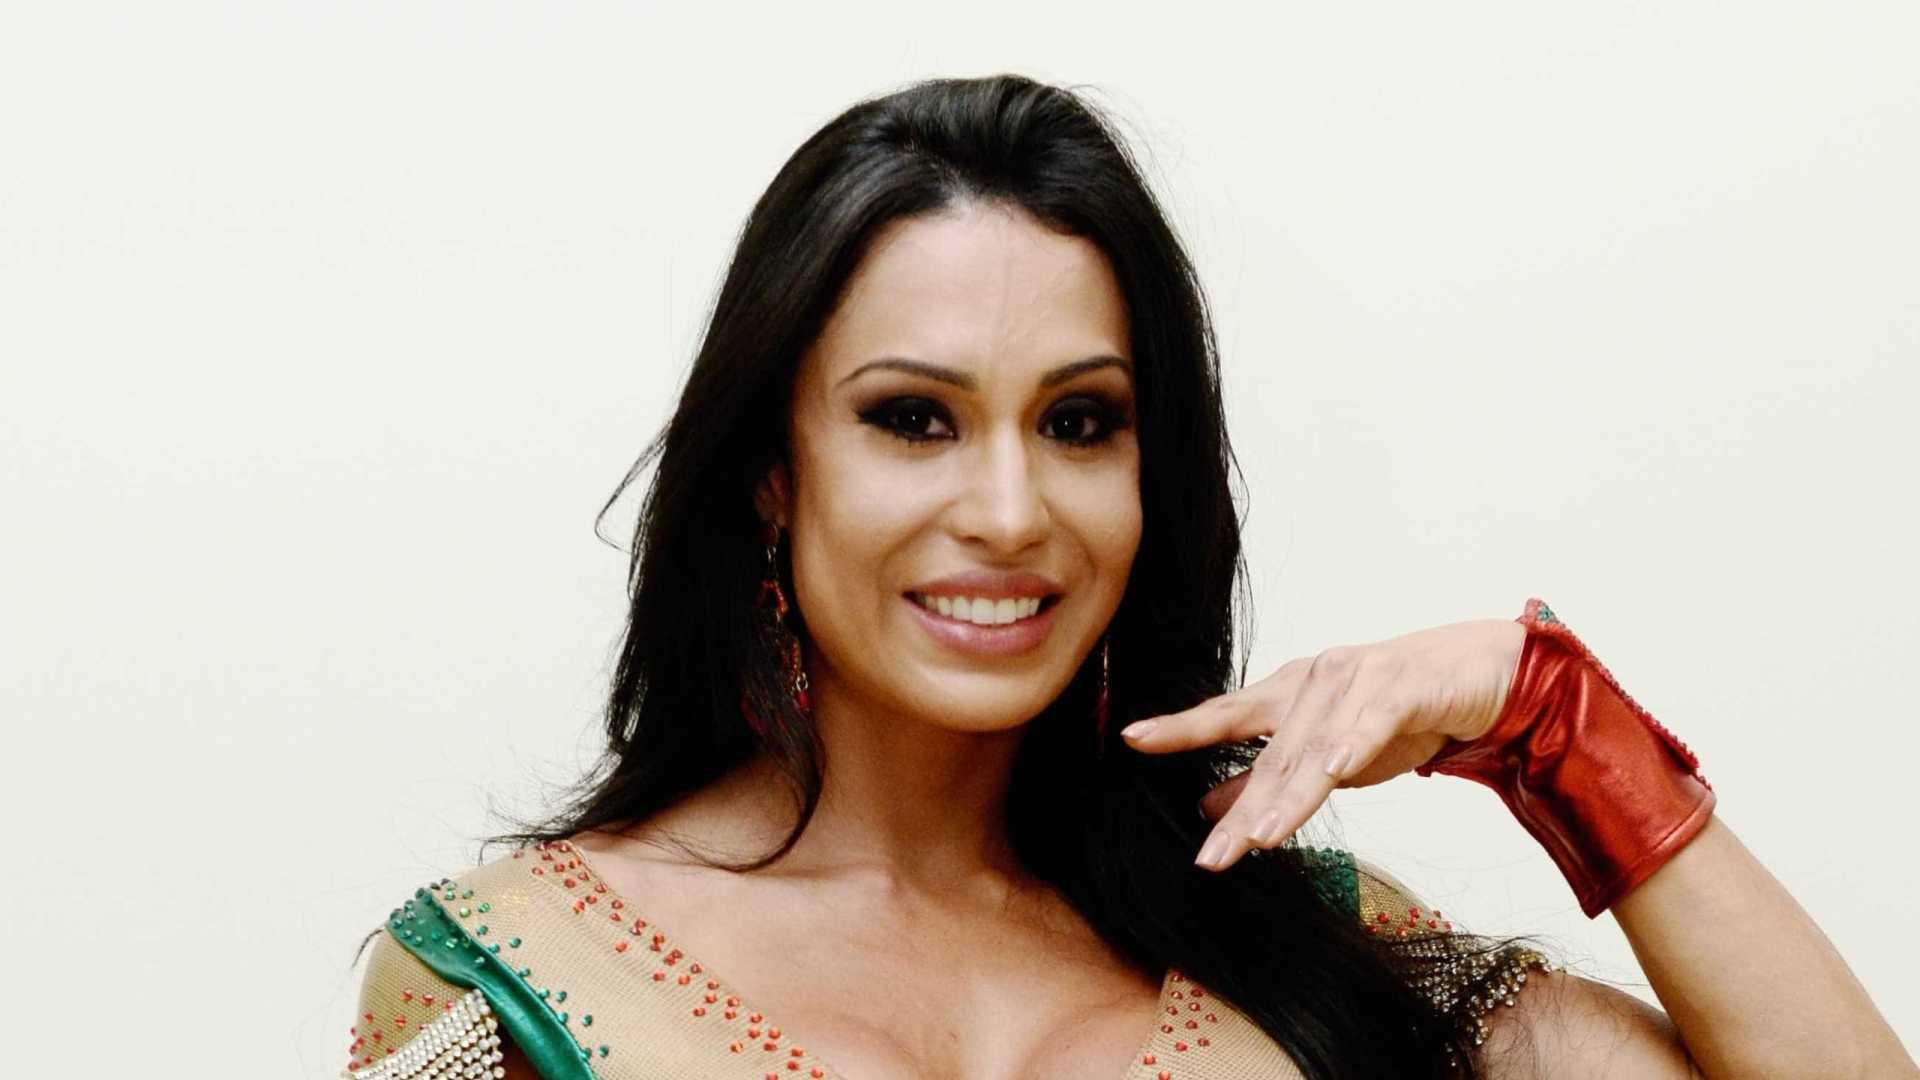 naom 5937d589bc6de - VEJA VÍDEO: Gracyanne Barbosa revela peso e diz que já teve orgasmo na academia